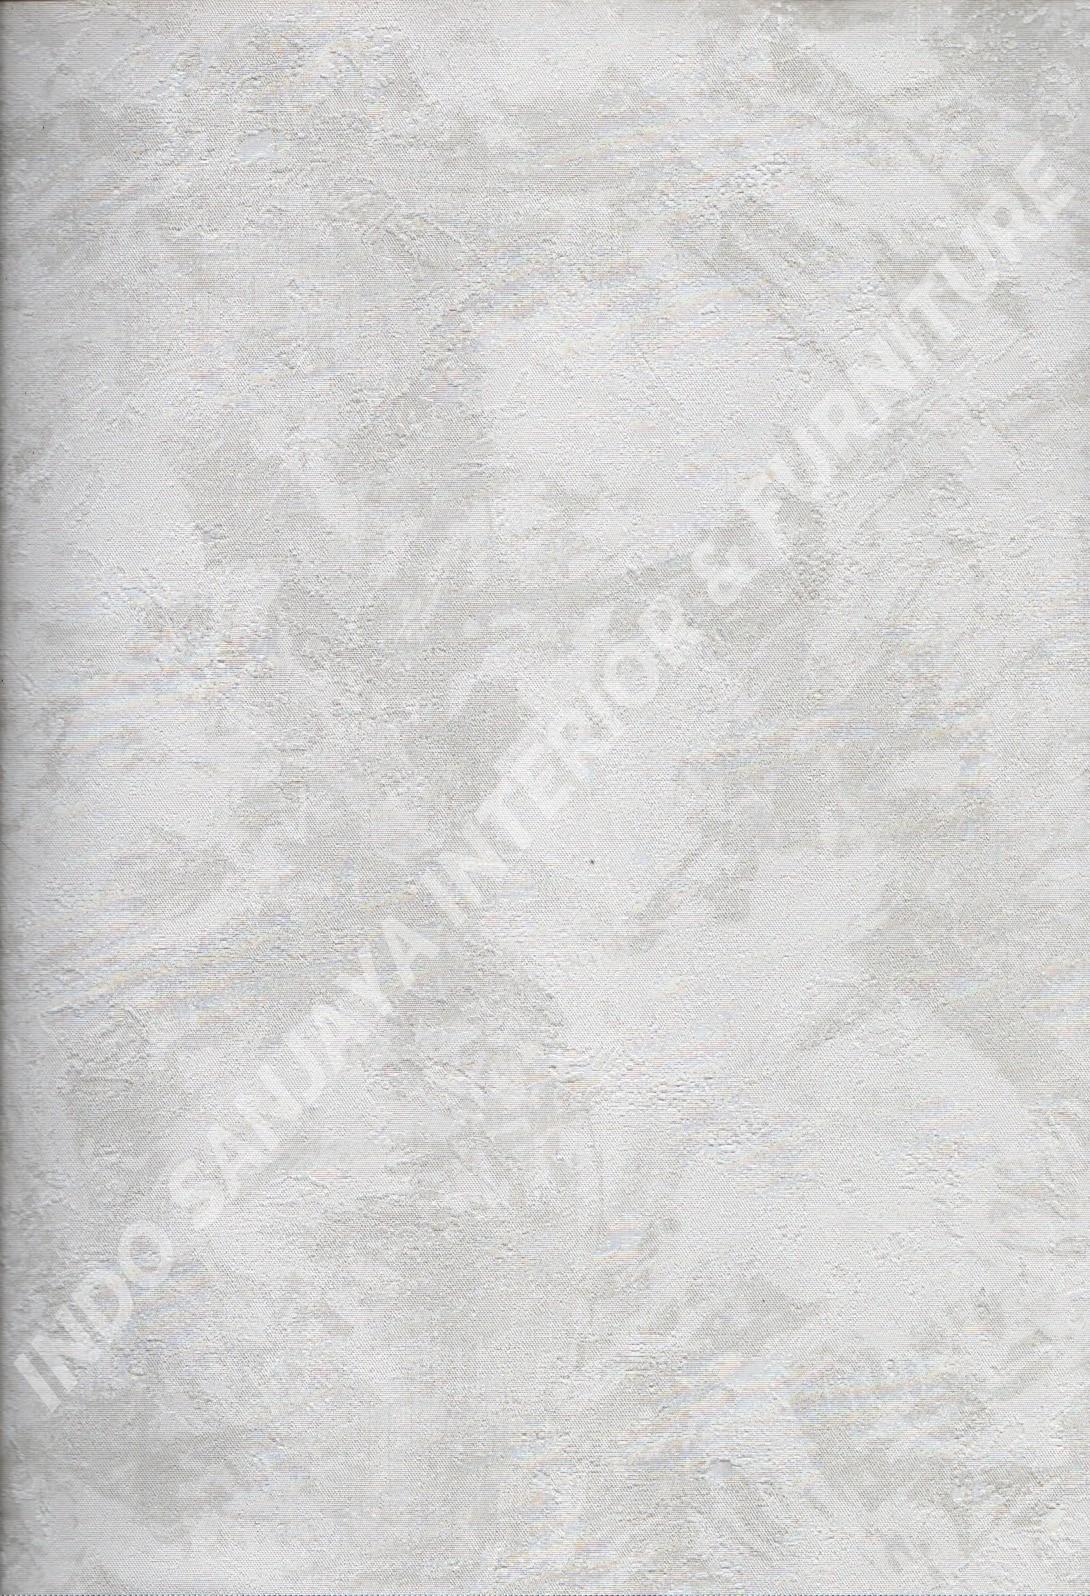 wallpaper BONITO:81081-1 corak Minimalis / Polos warna Putih ,Abu-Abu